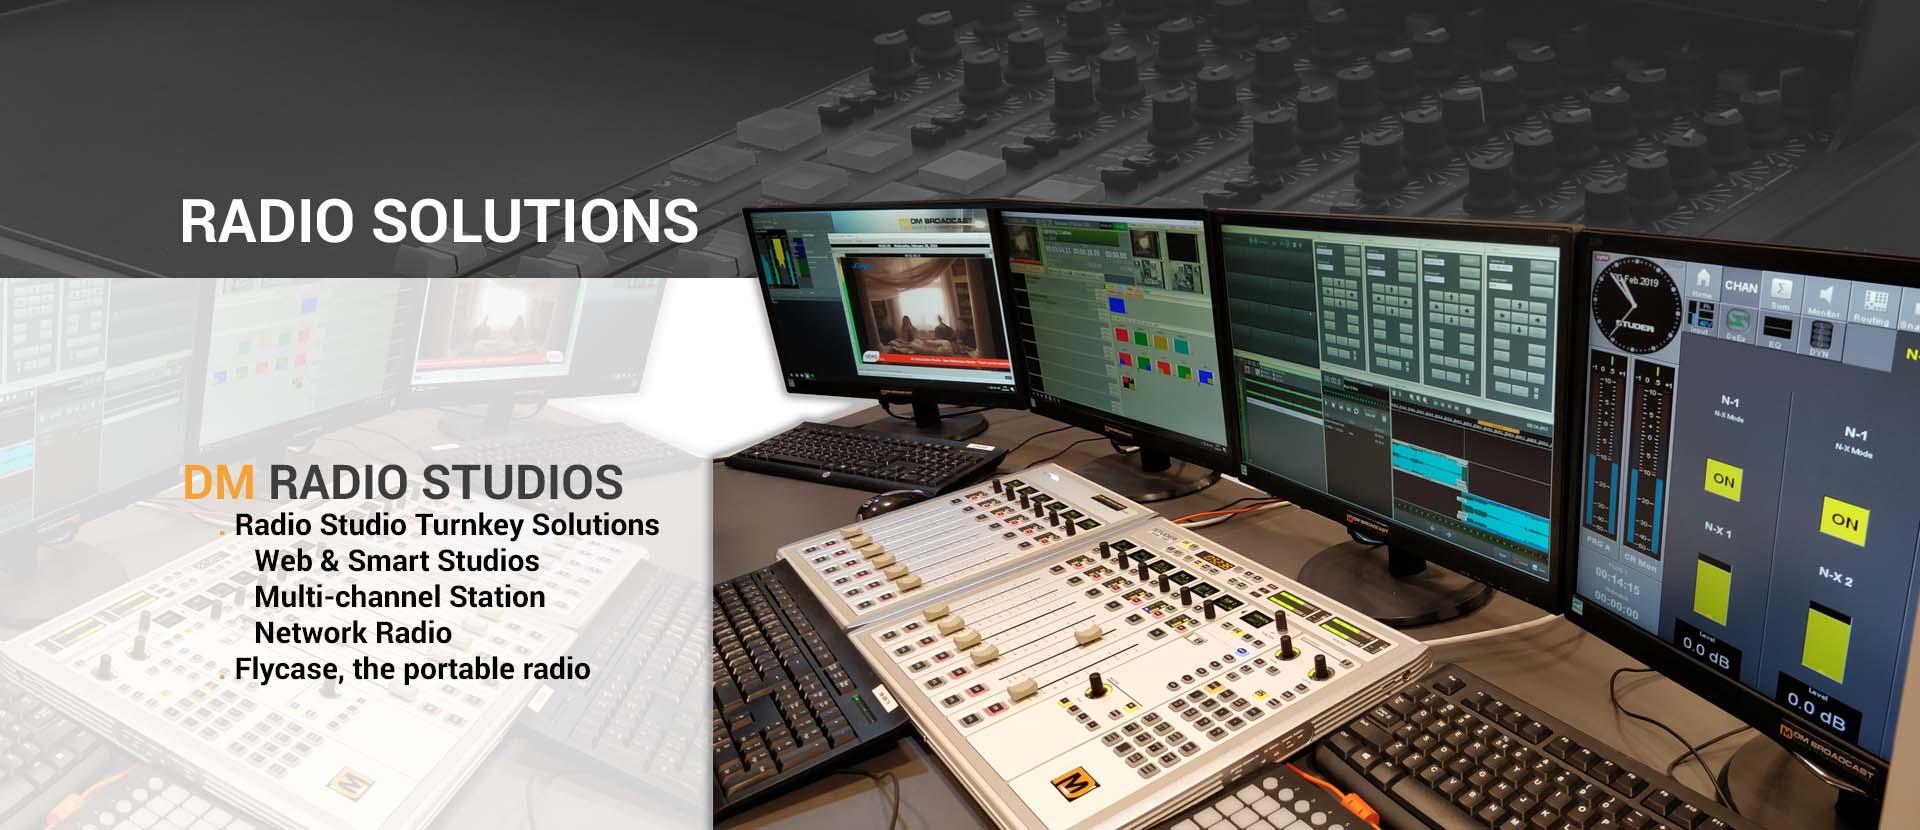 slide_radio_solutions